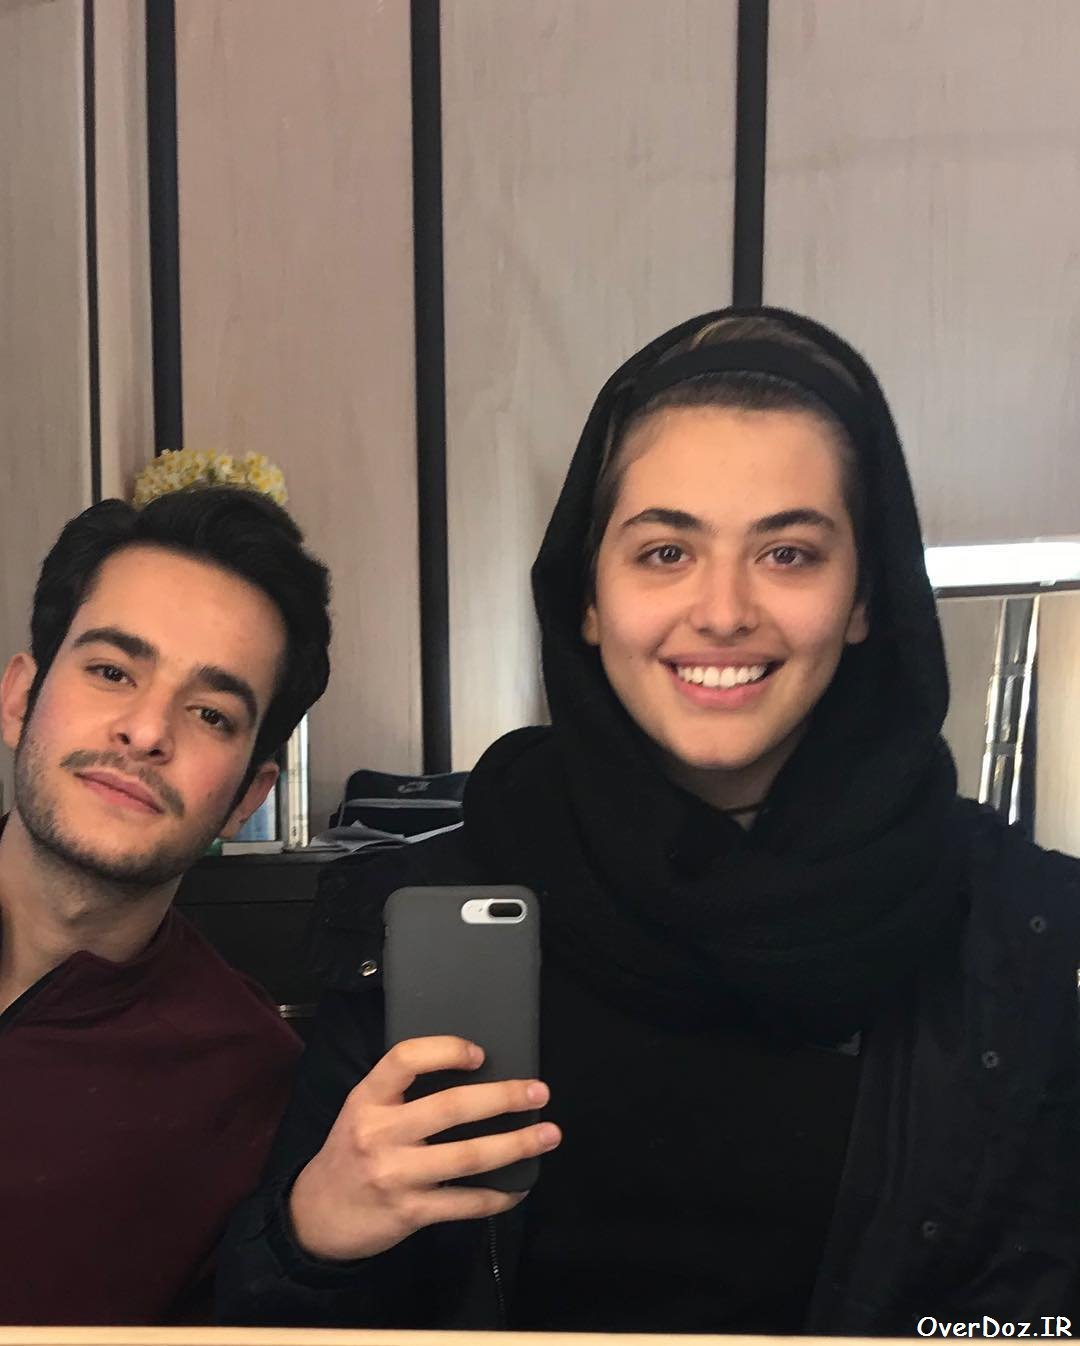 Reyhaneh-Parsa-OldFriend-www-OverDoz-IR (2)